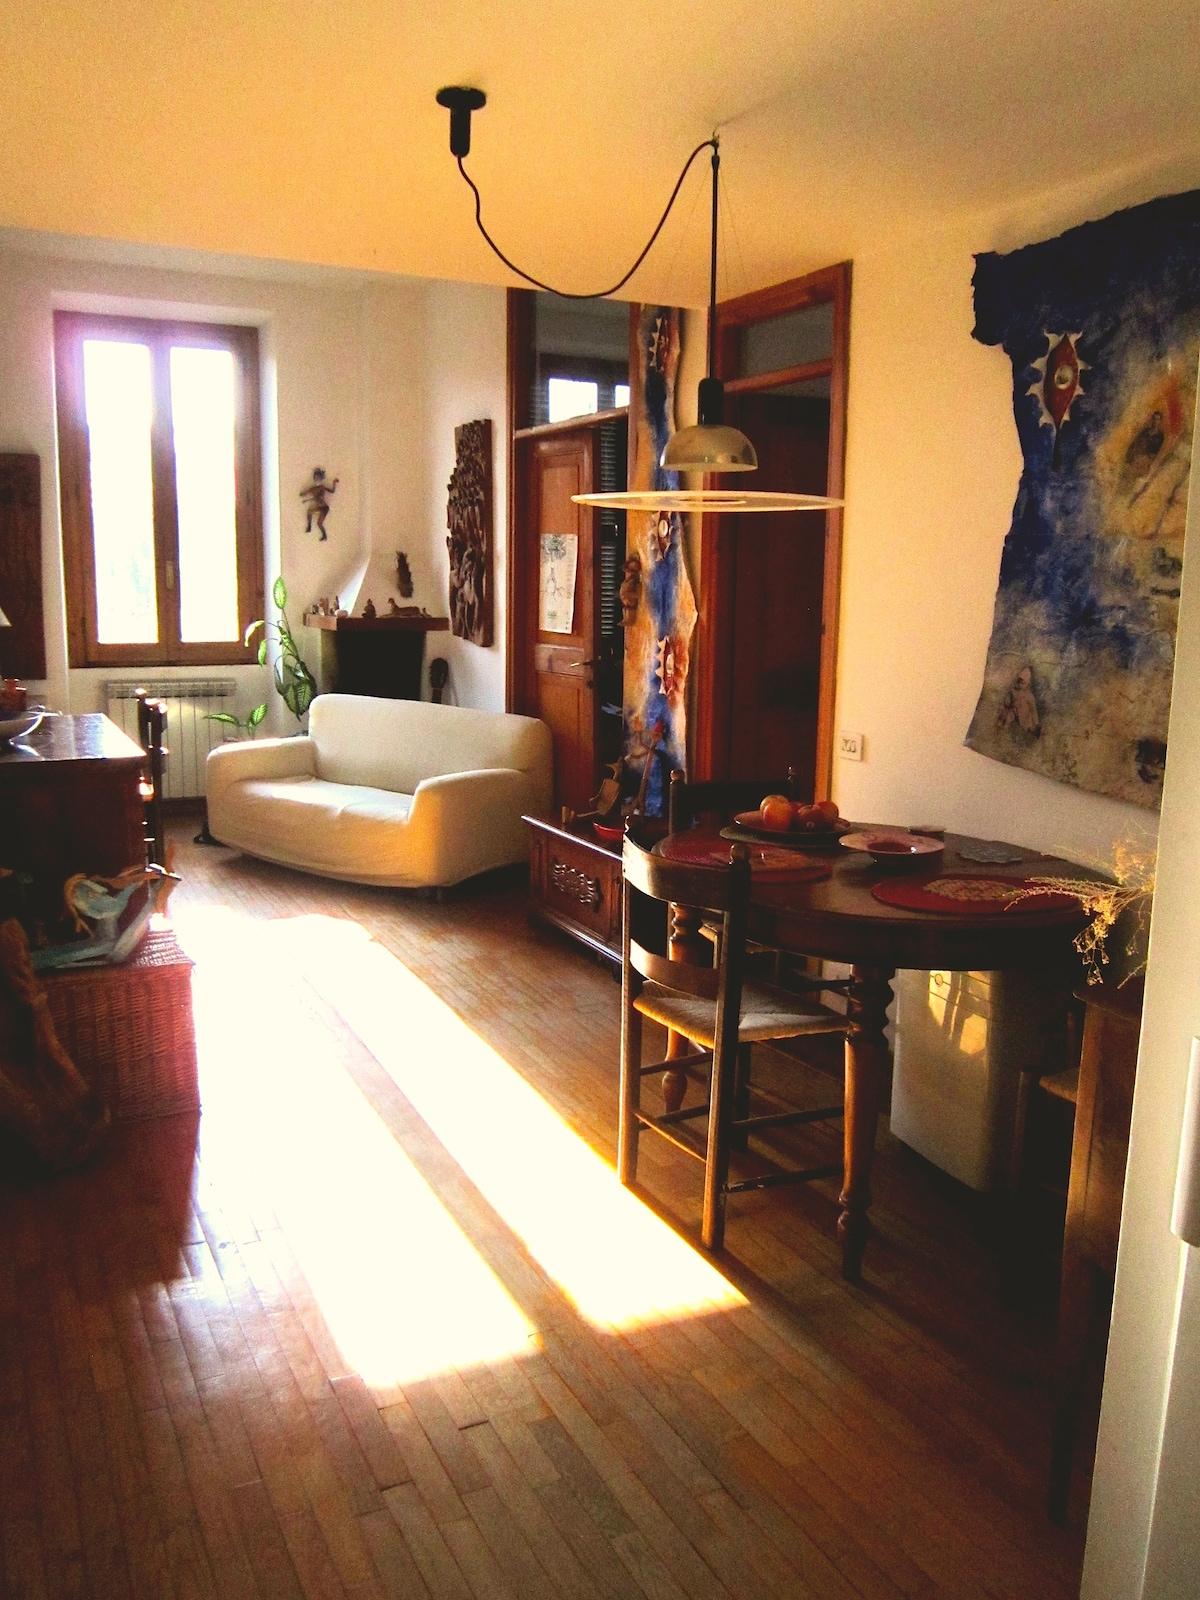 St. Peter -Room in art apartment